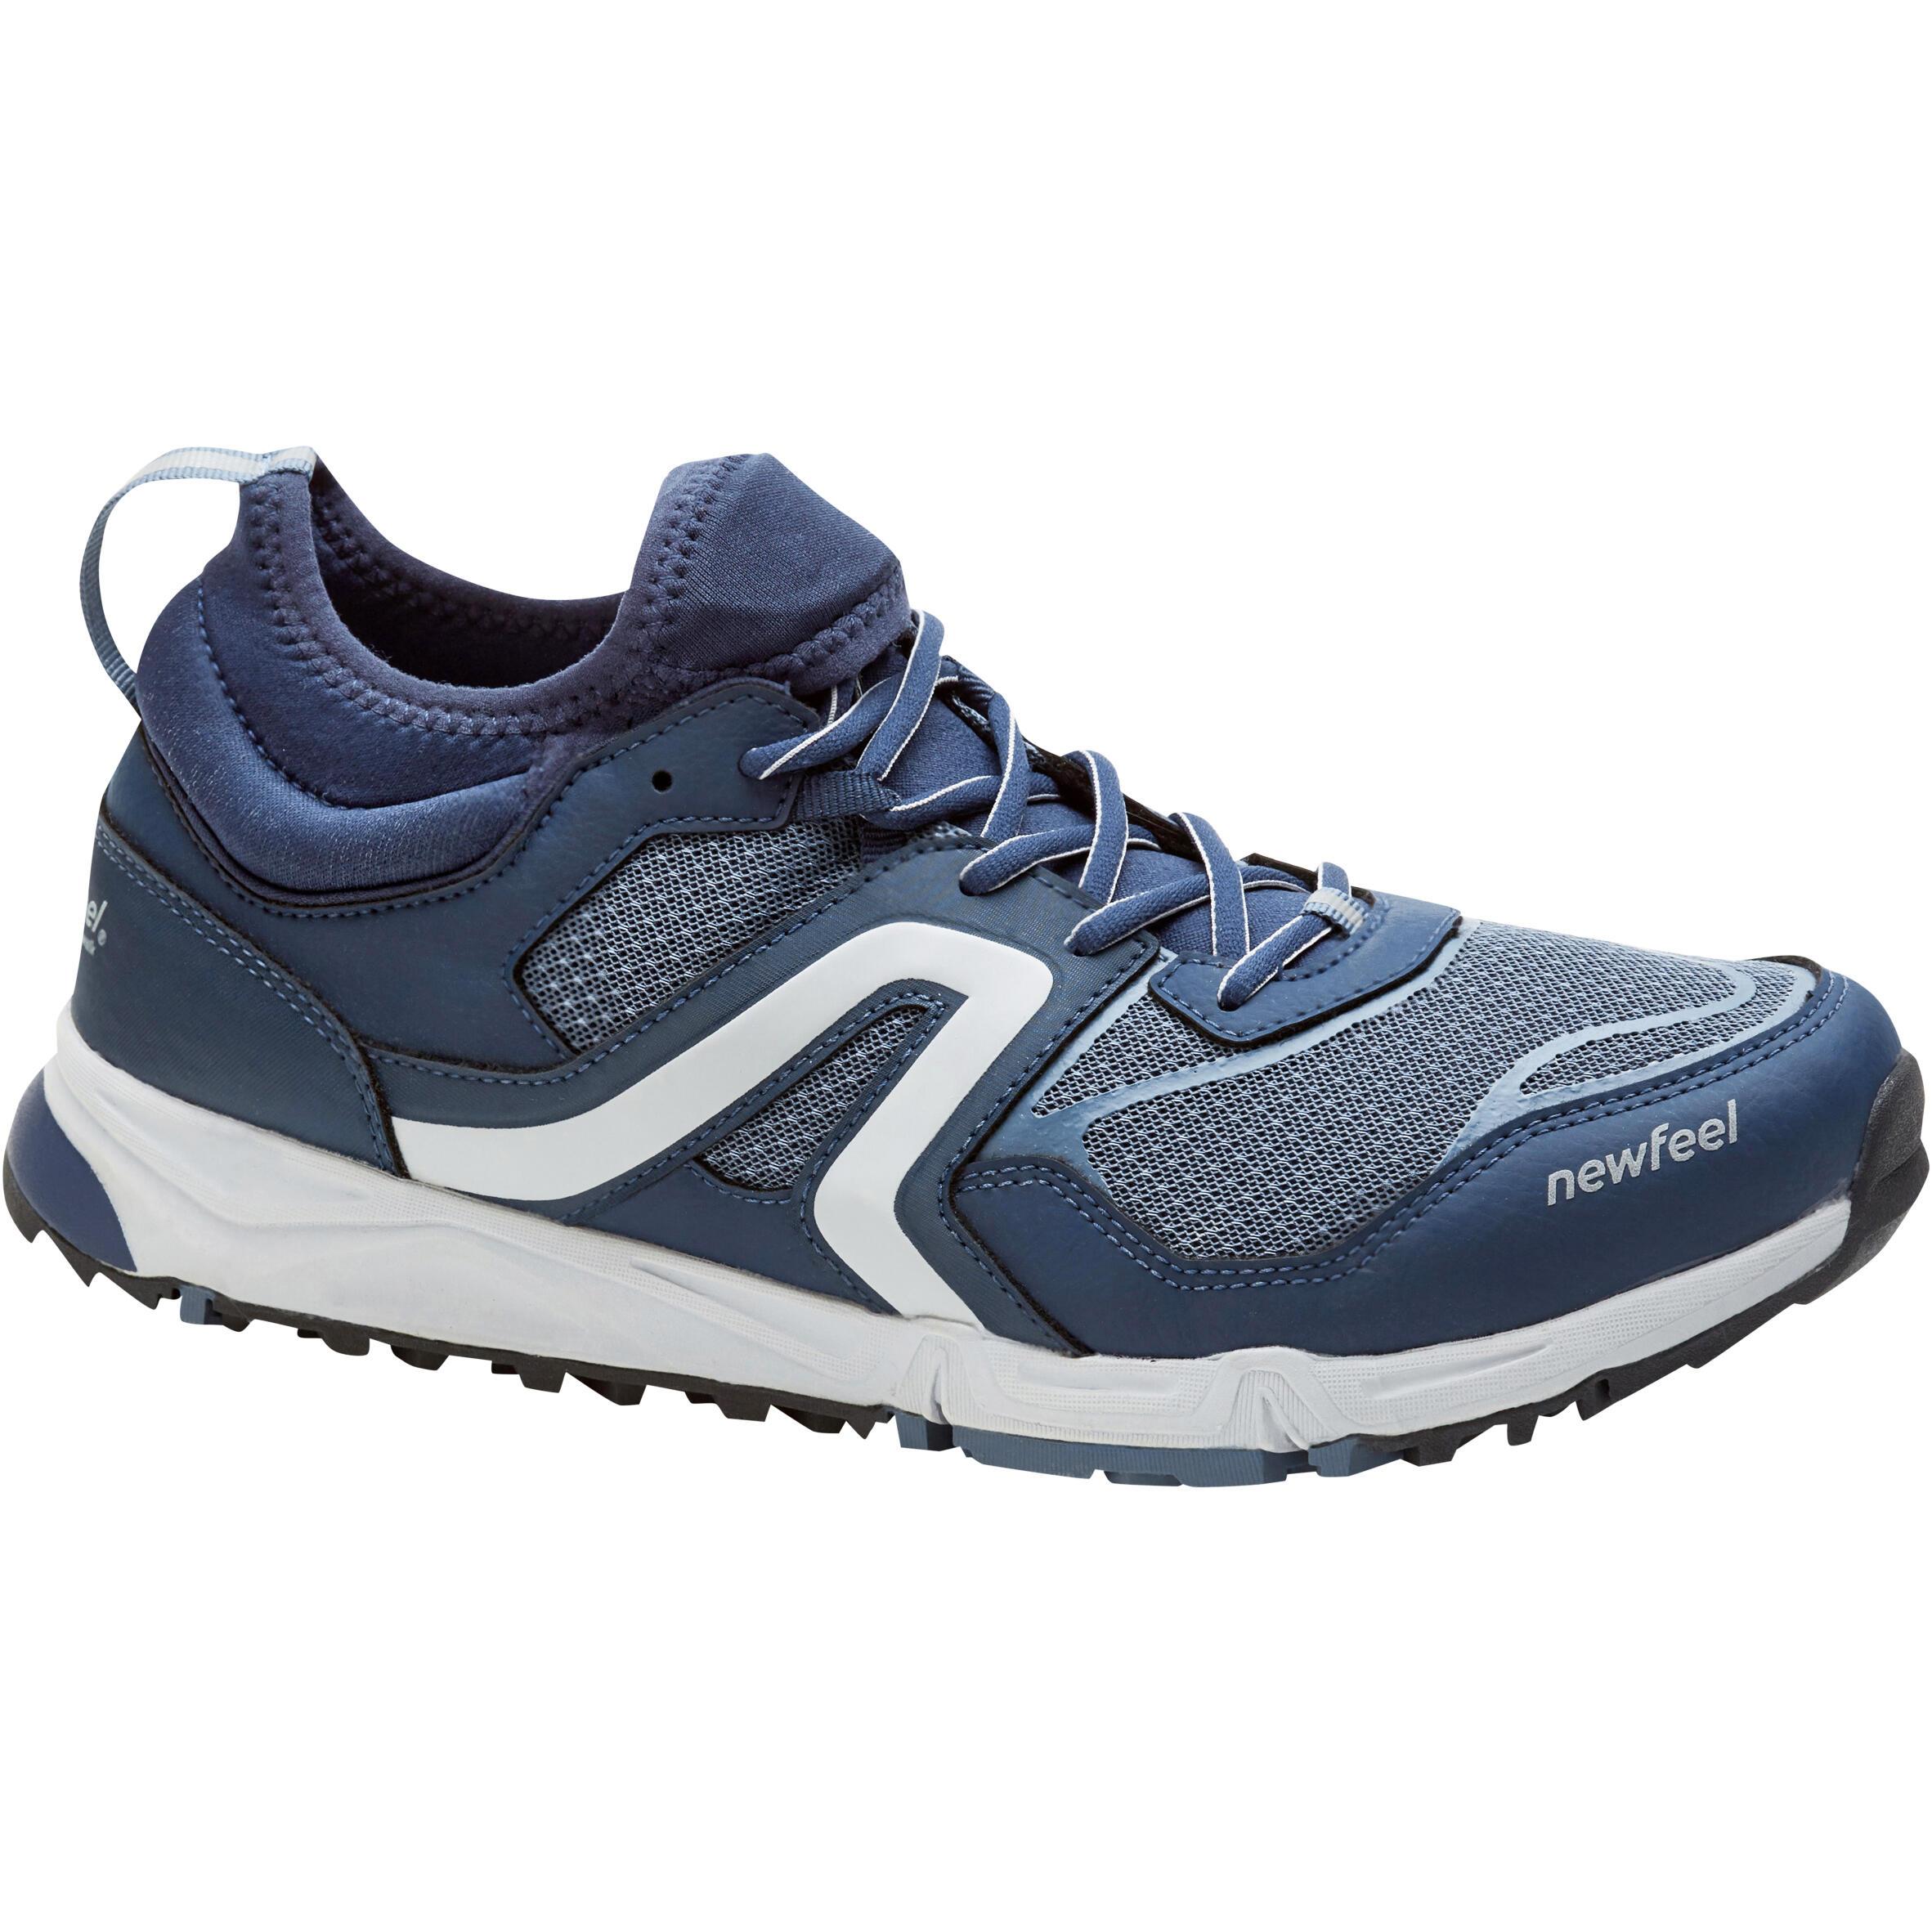 Newfeel Chaussures de marche nordique homme NW 500 Flex-H bleu marine / gris - Newfeel